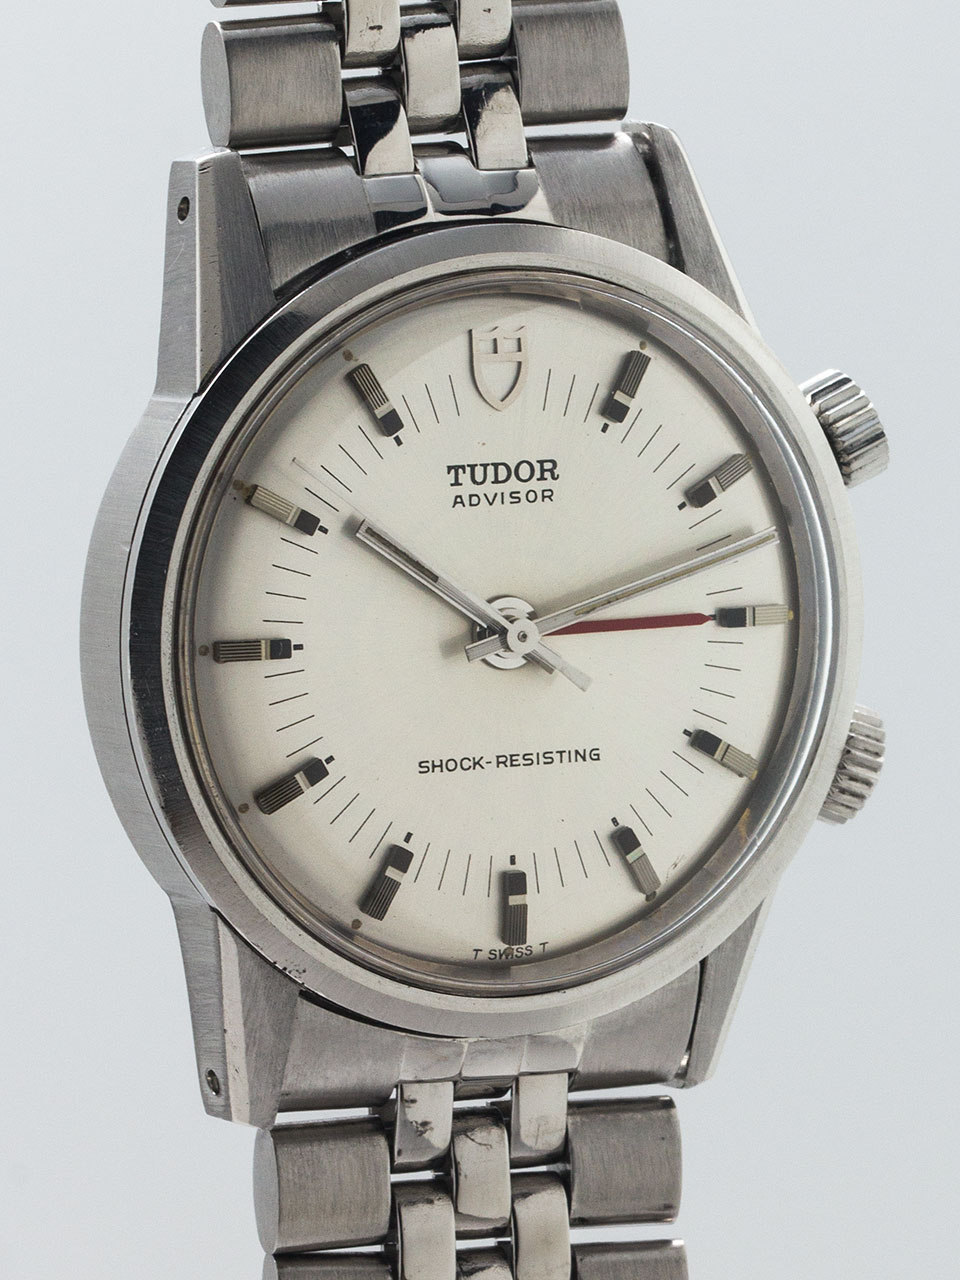 Tudor Advisor Alarm Stainless Steel circa 1970